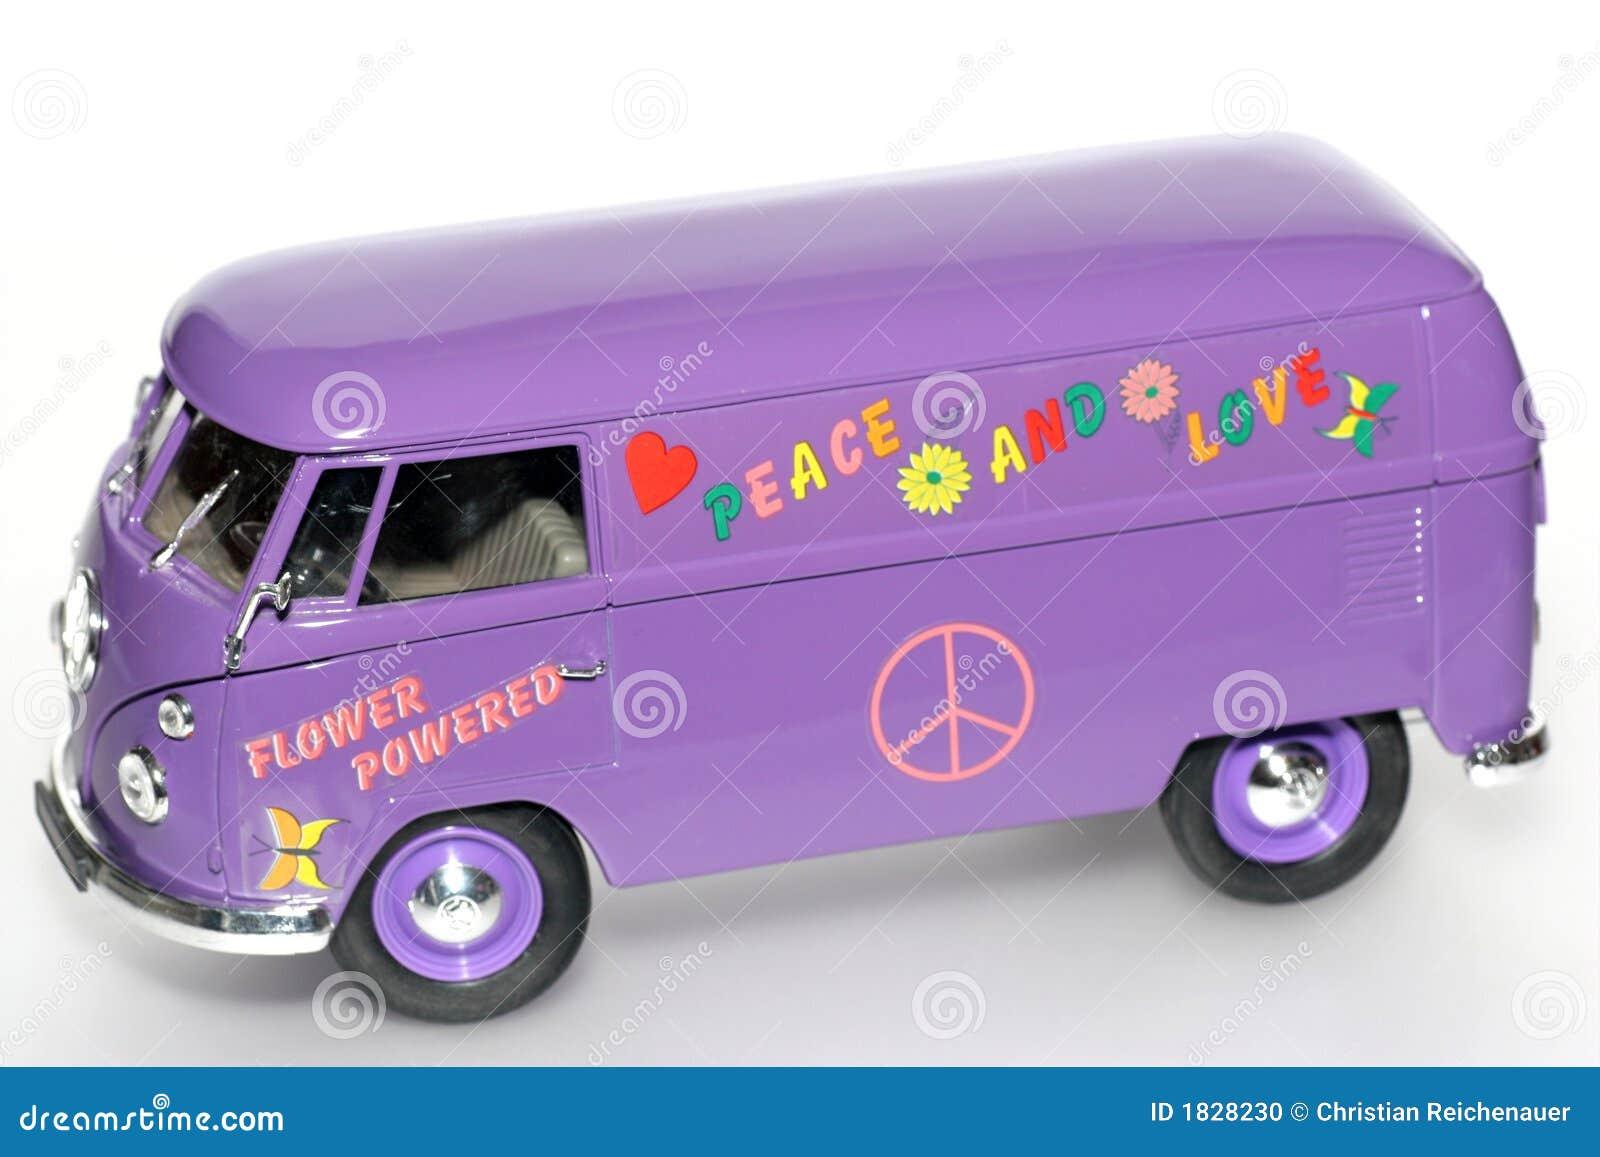 Flower power toy VW bus